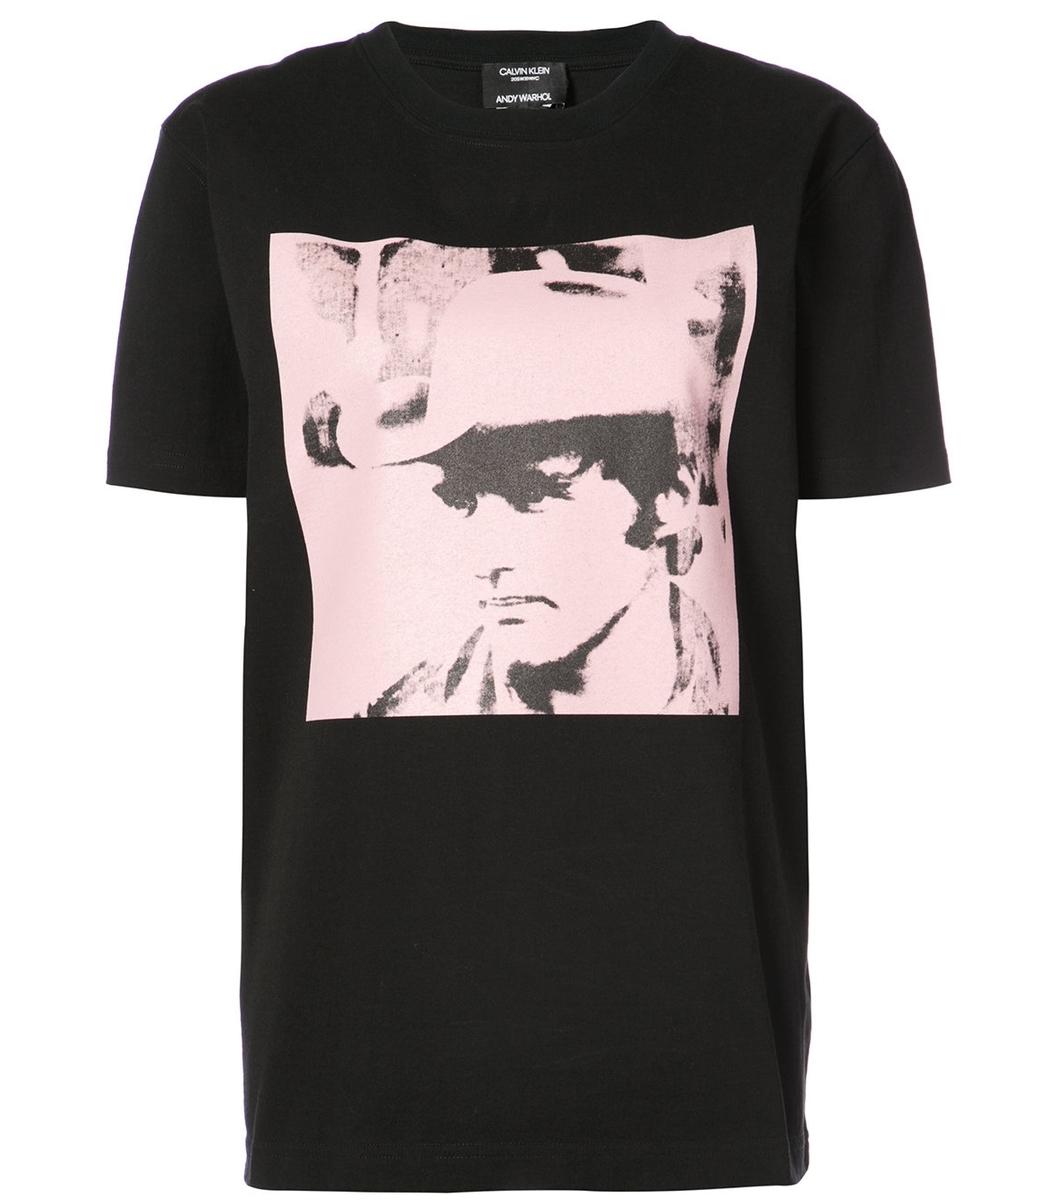 Calvin Klein X Andy Warhol Dennis Hopper T-Shirt in Black Pink